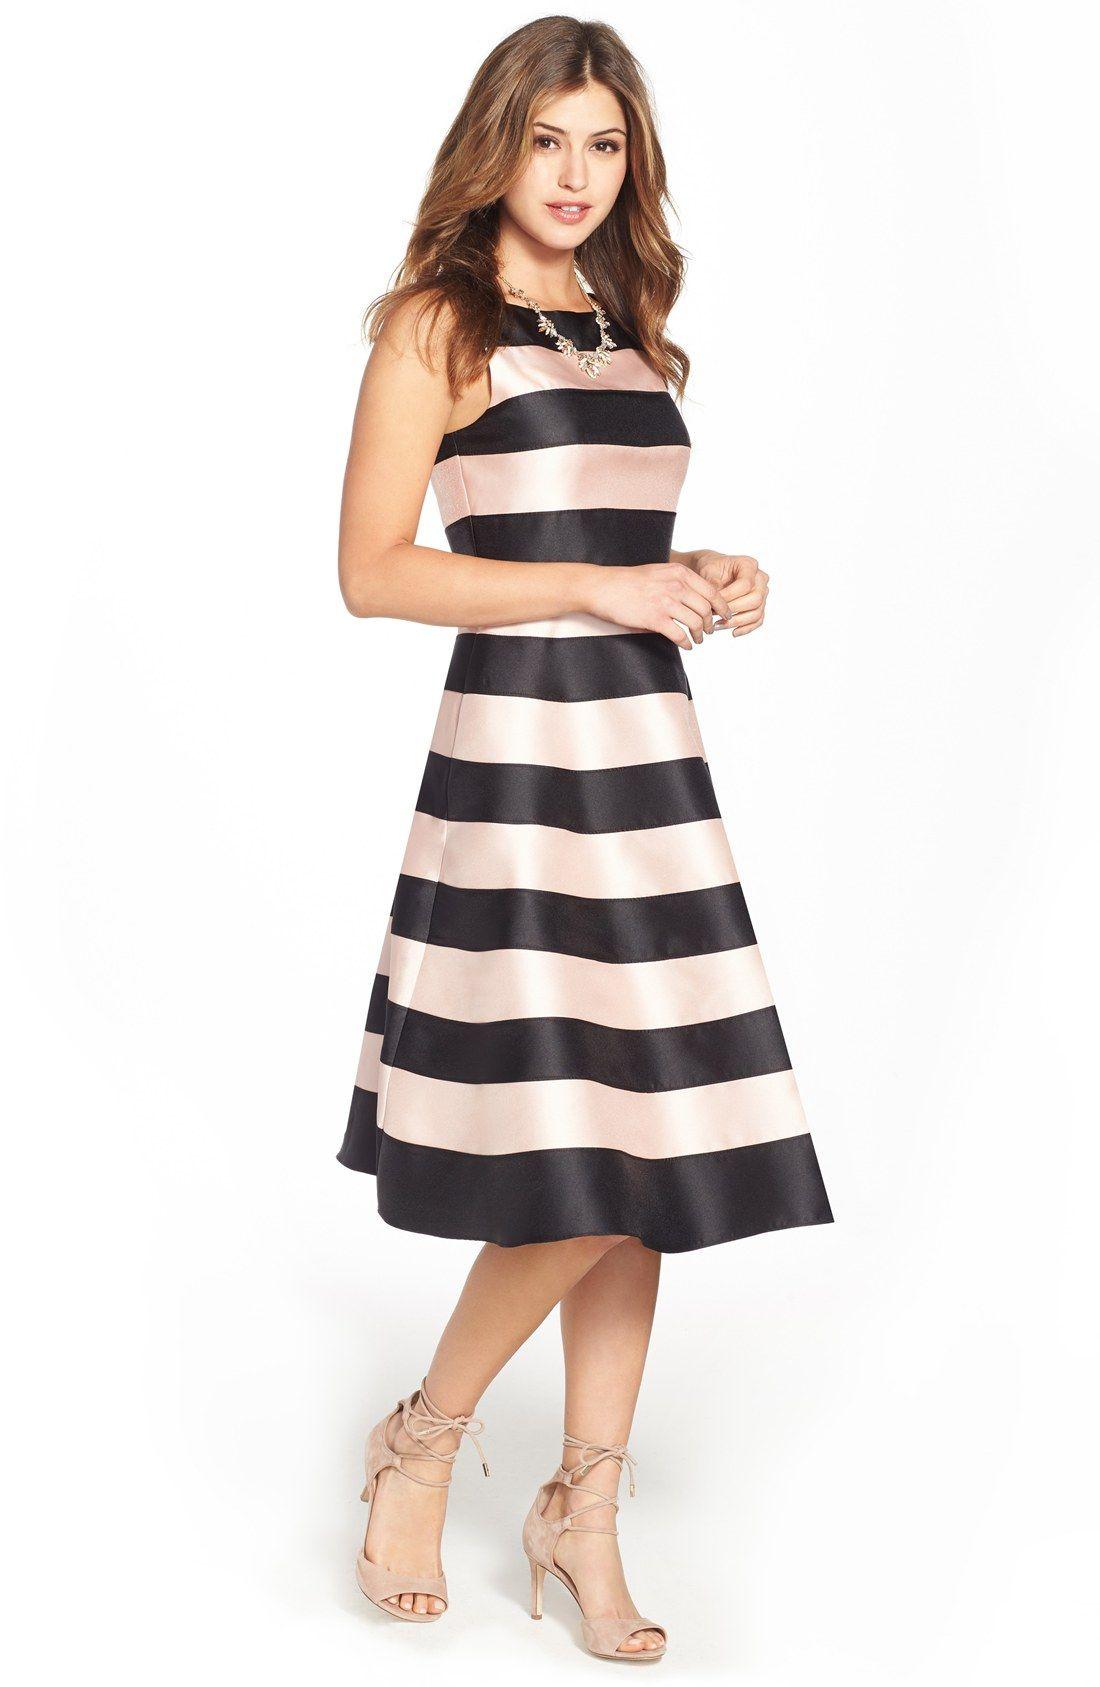 Blush pink and black stripe party dress Dresses, Striped